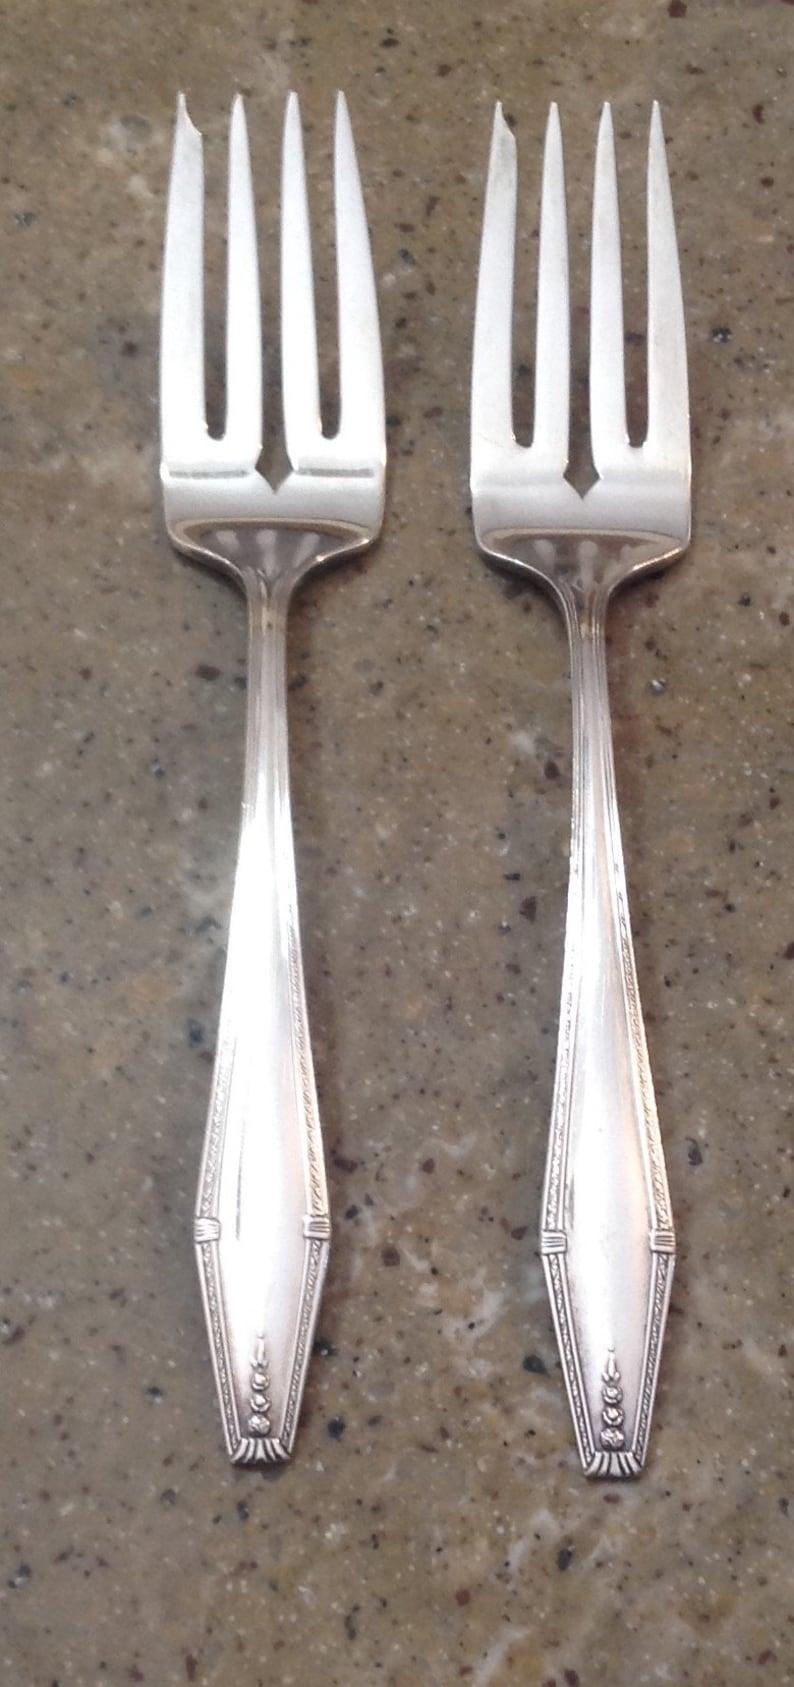 State House Salad Fork Vintage 1942 Sterling Silver Formality Silverware Fork